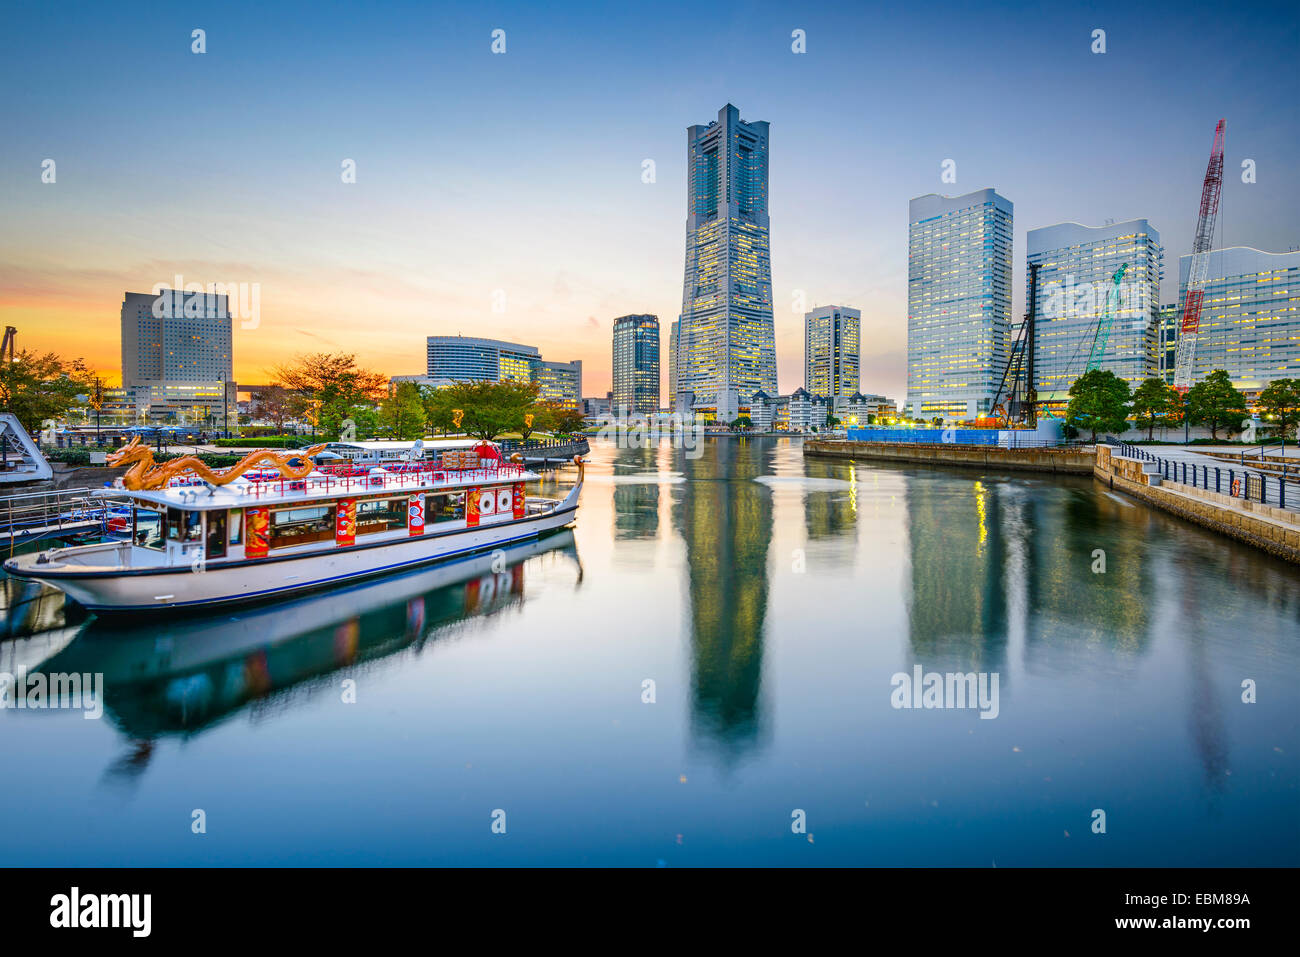 Yokohama, Japan cityscape at Minato-Mirai waterfront. - Stock Image